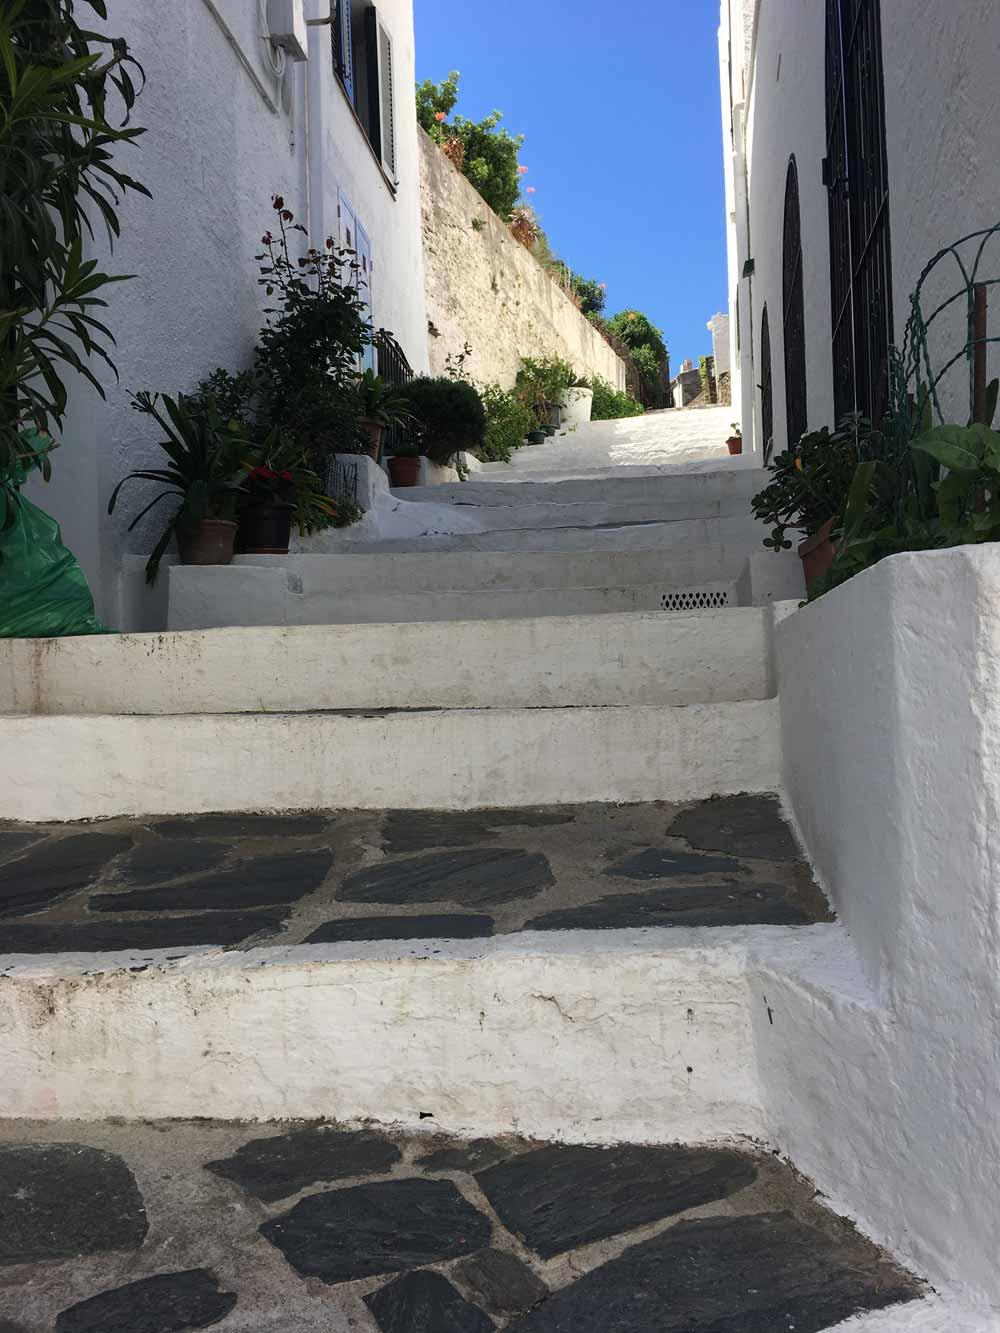 Spanish backstreet steps